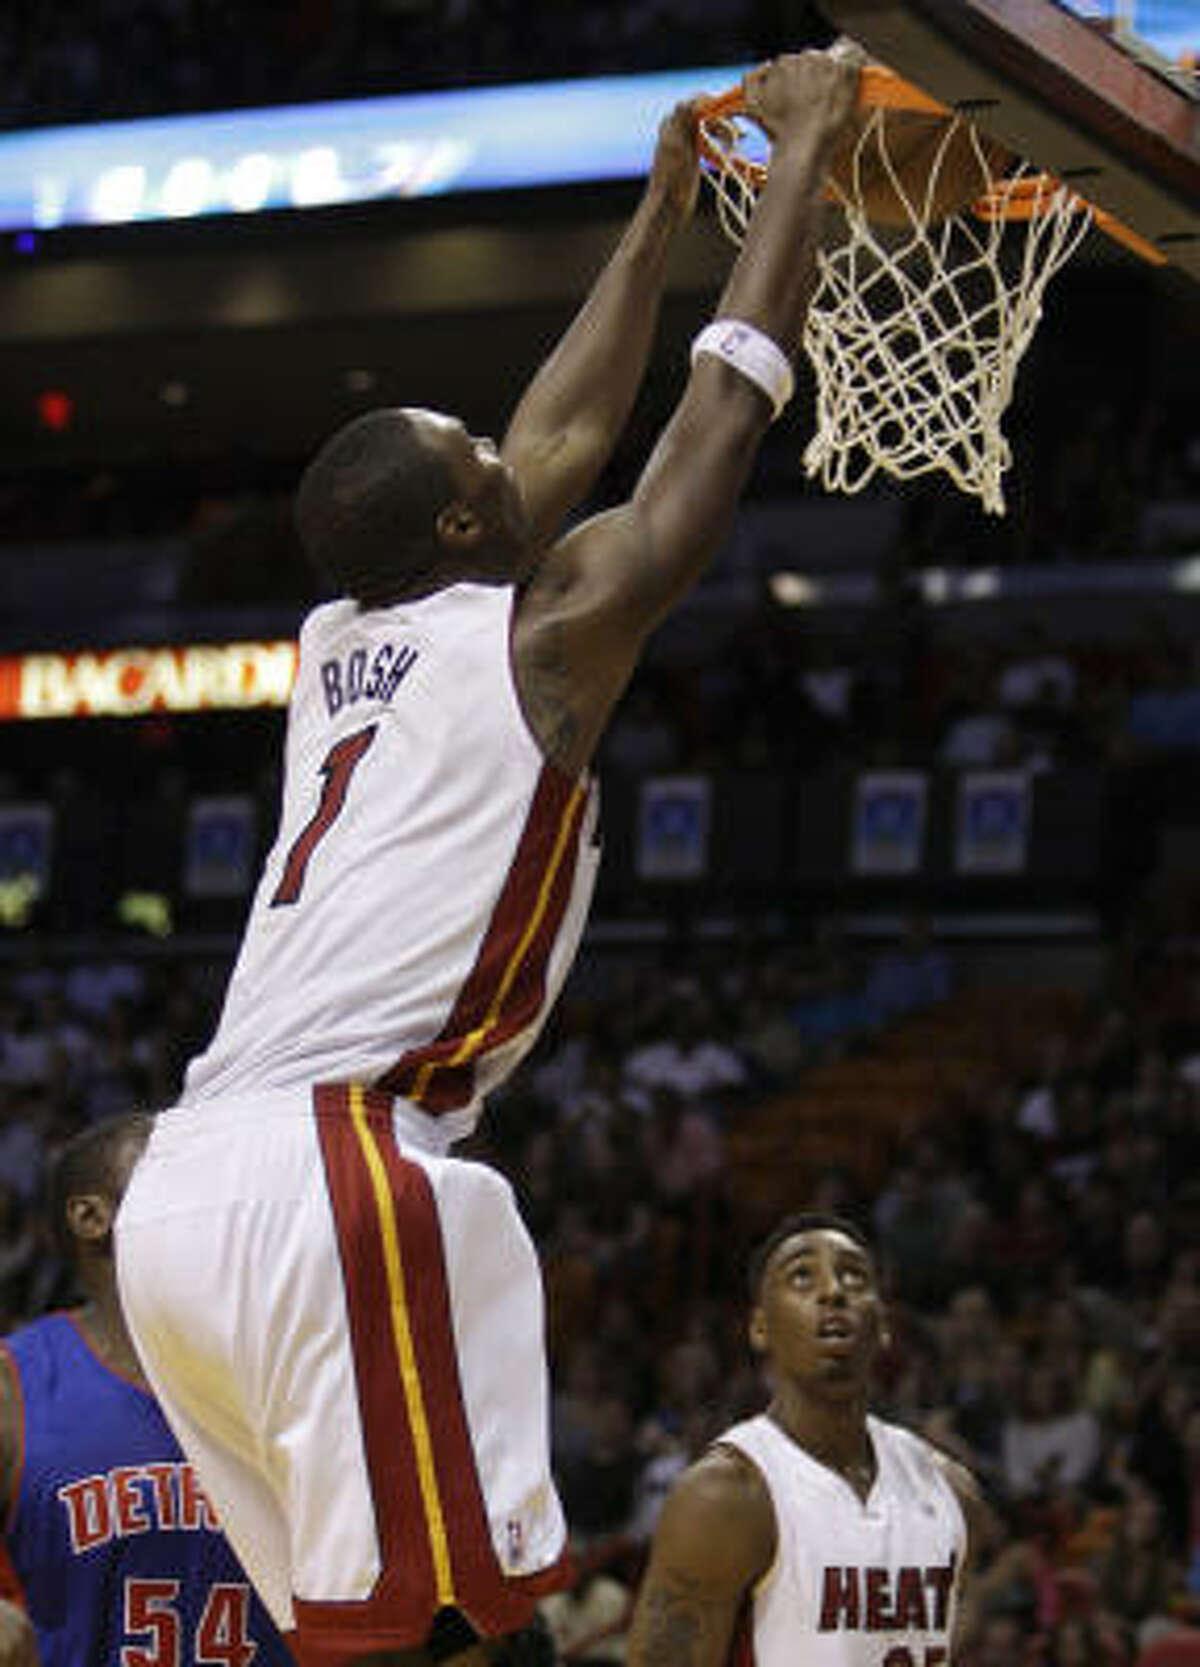 Heat power forward Chris Bosh dunks during the second quarter.